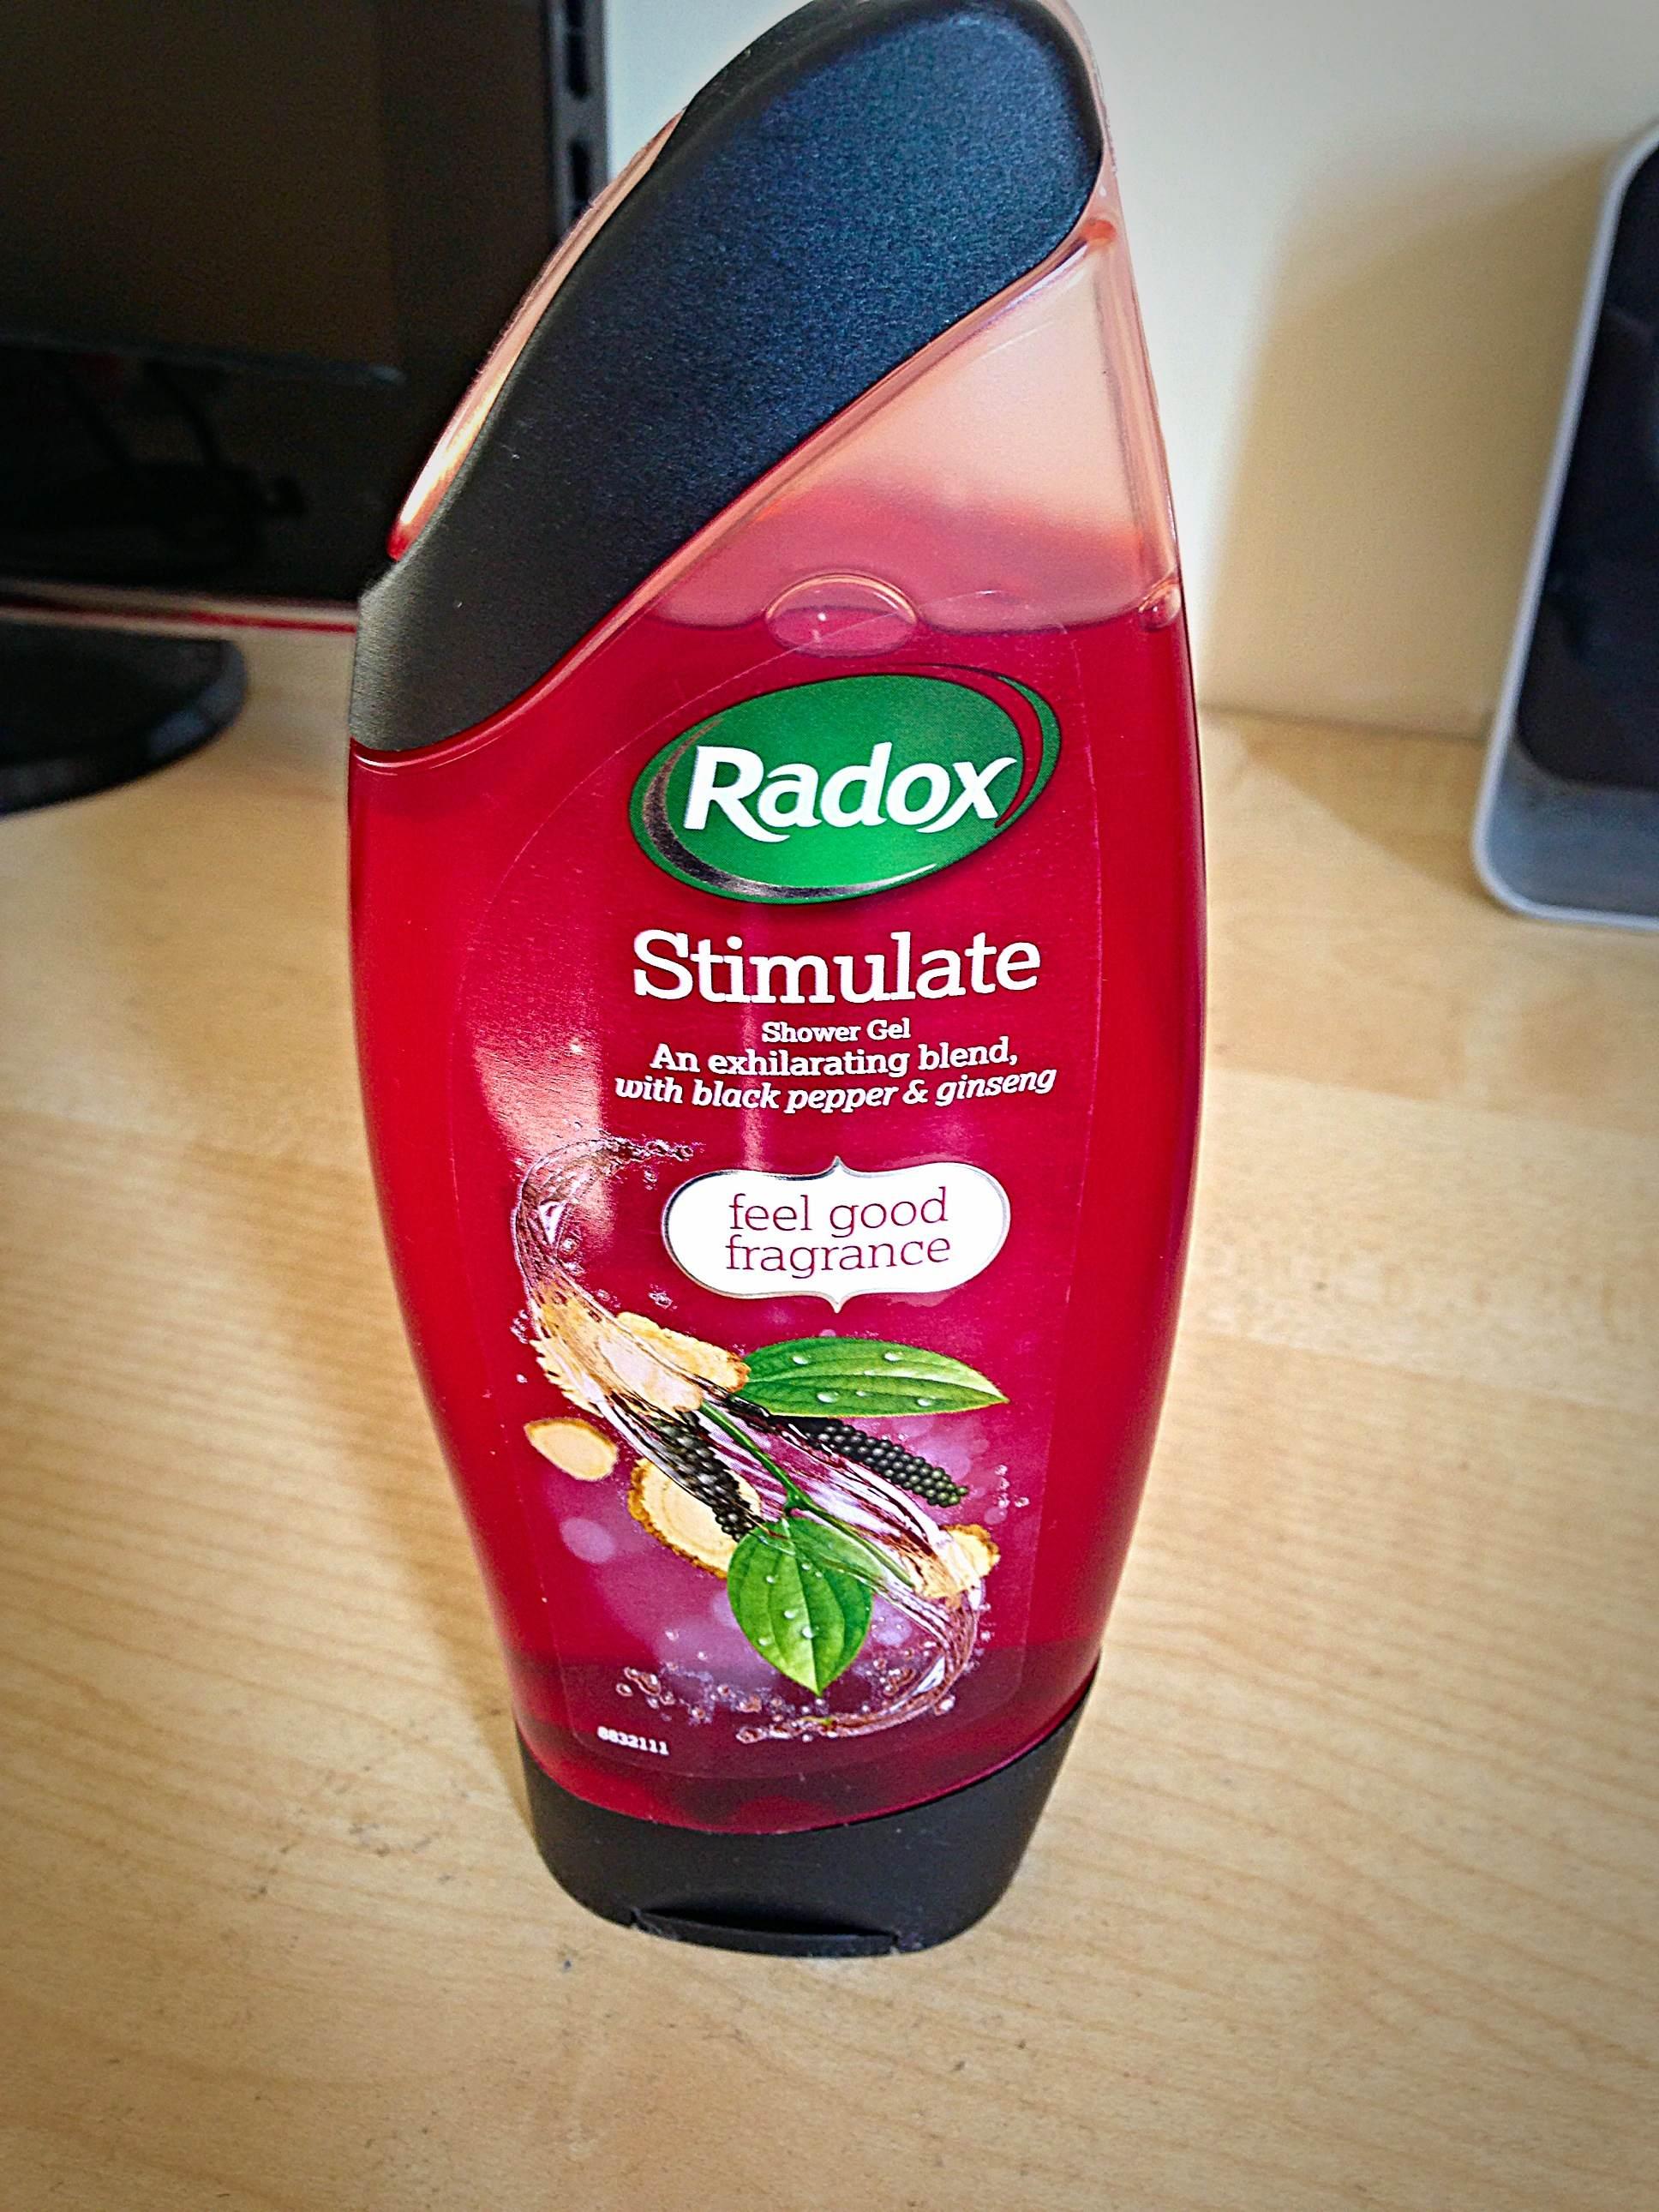 Radox Black Pepper & Ginseng Shower Gel